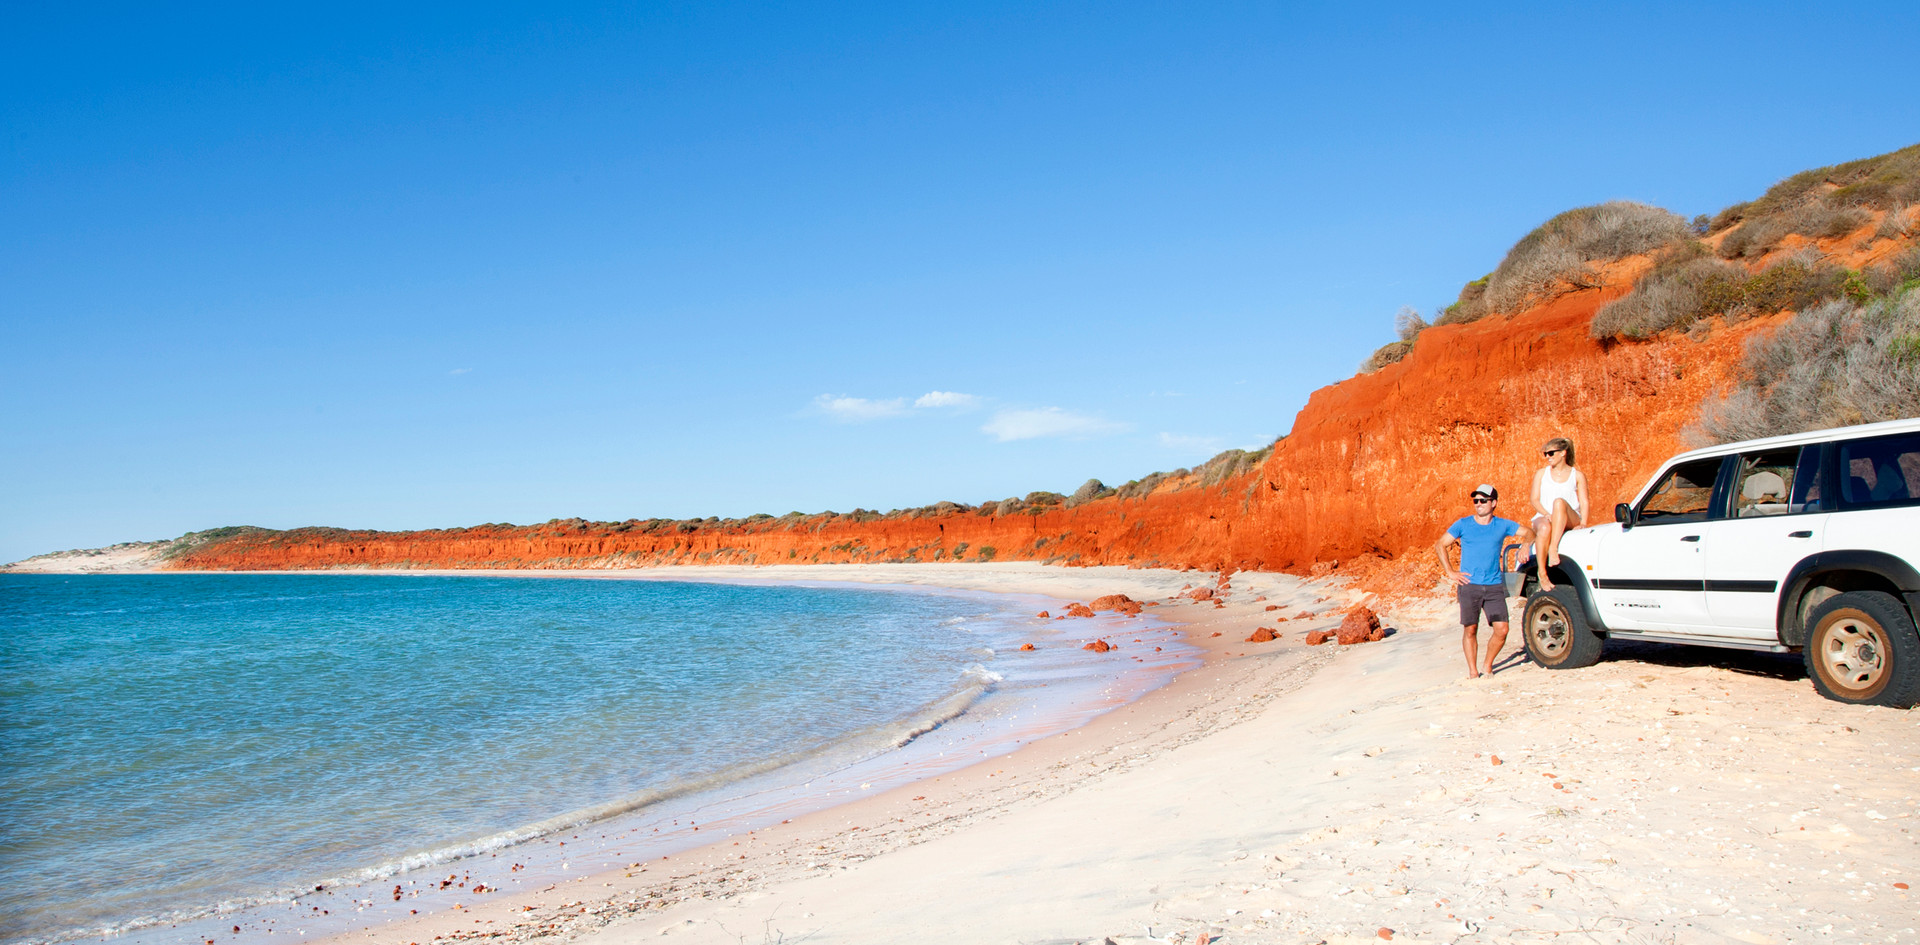 Cape Peron, Shark Bay World Heritage Are